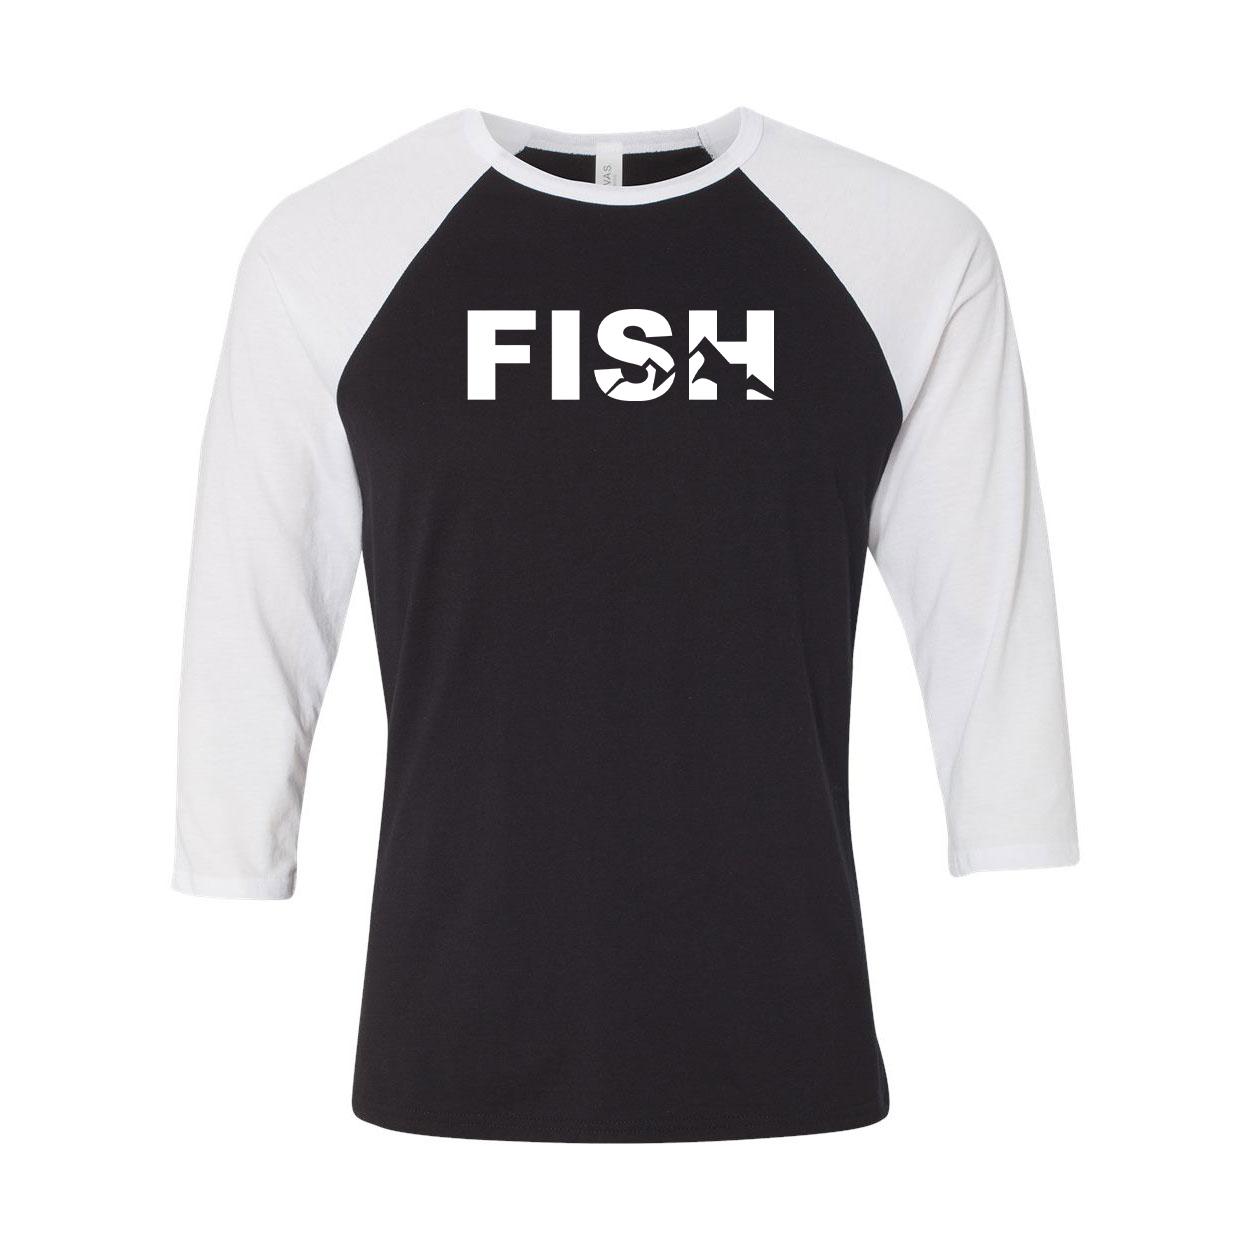 Fish Mountain Logo Classic Raglan Shirt Black/White (White Logo)